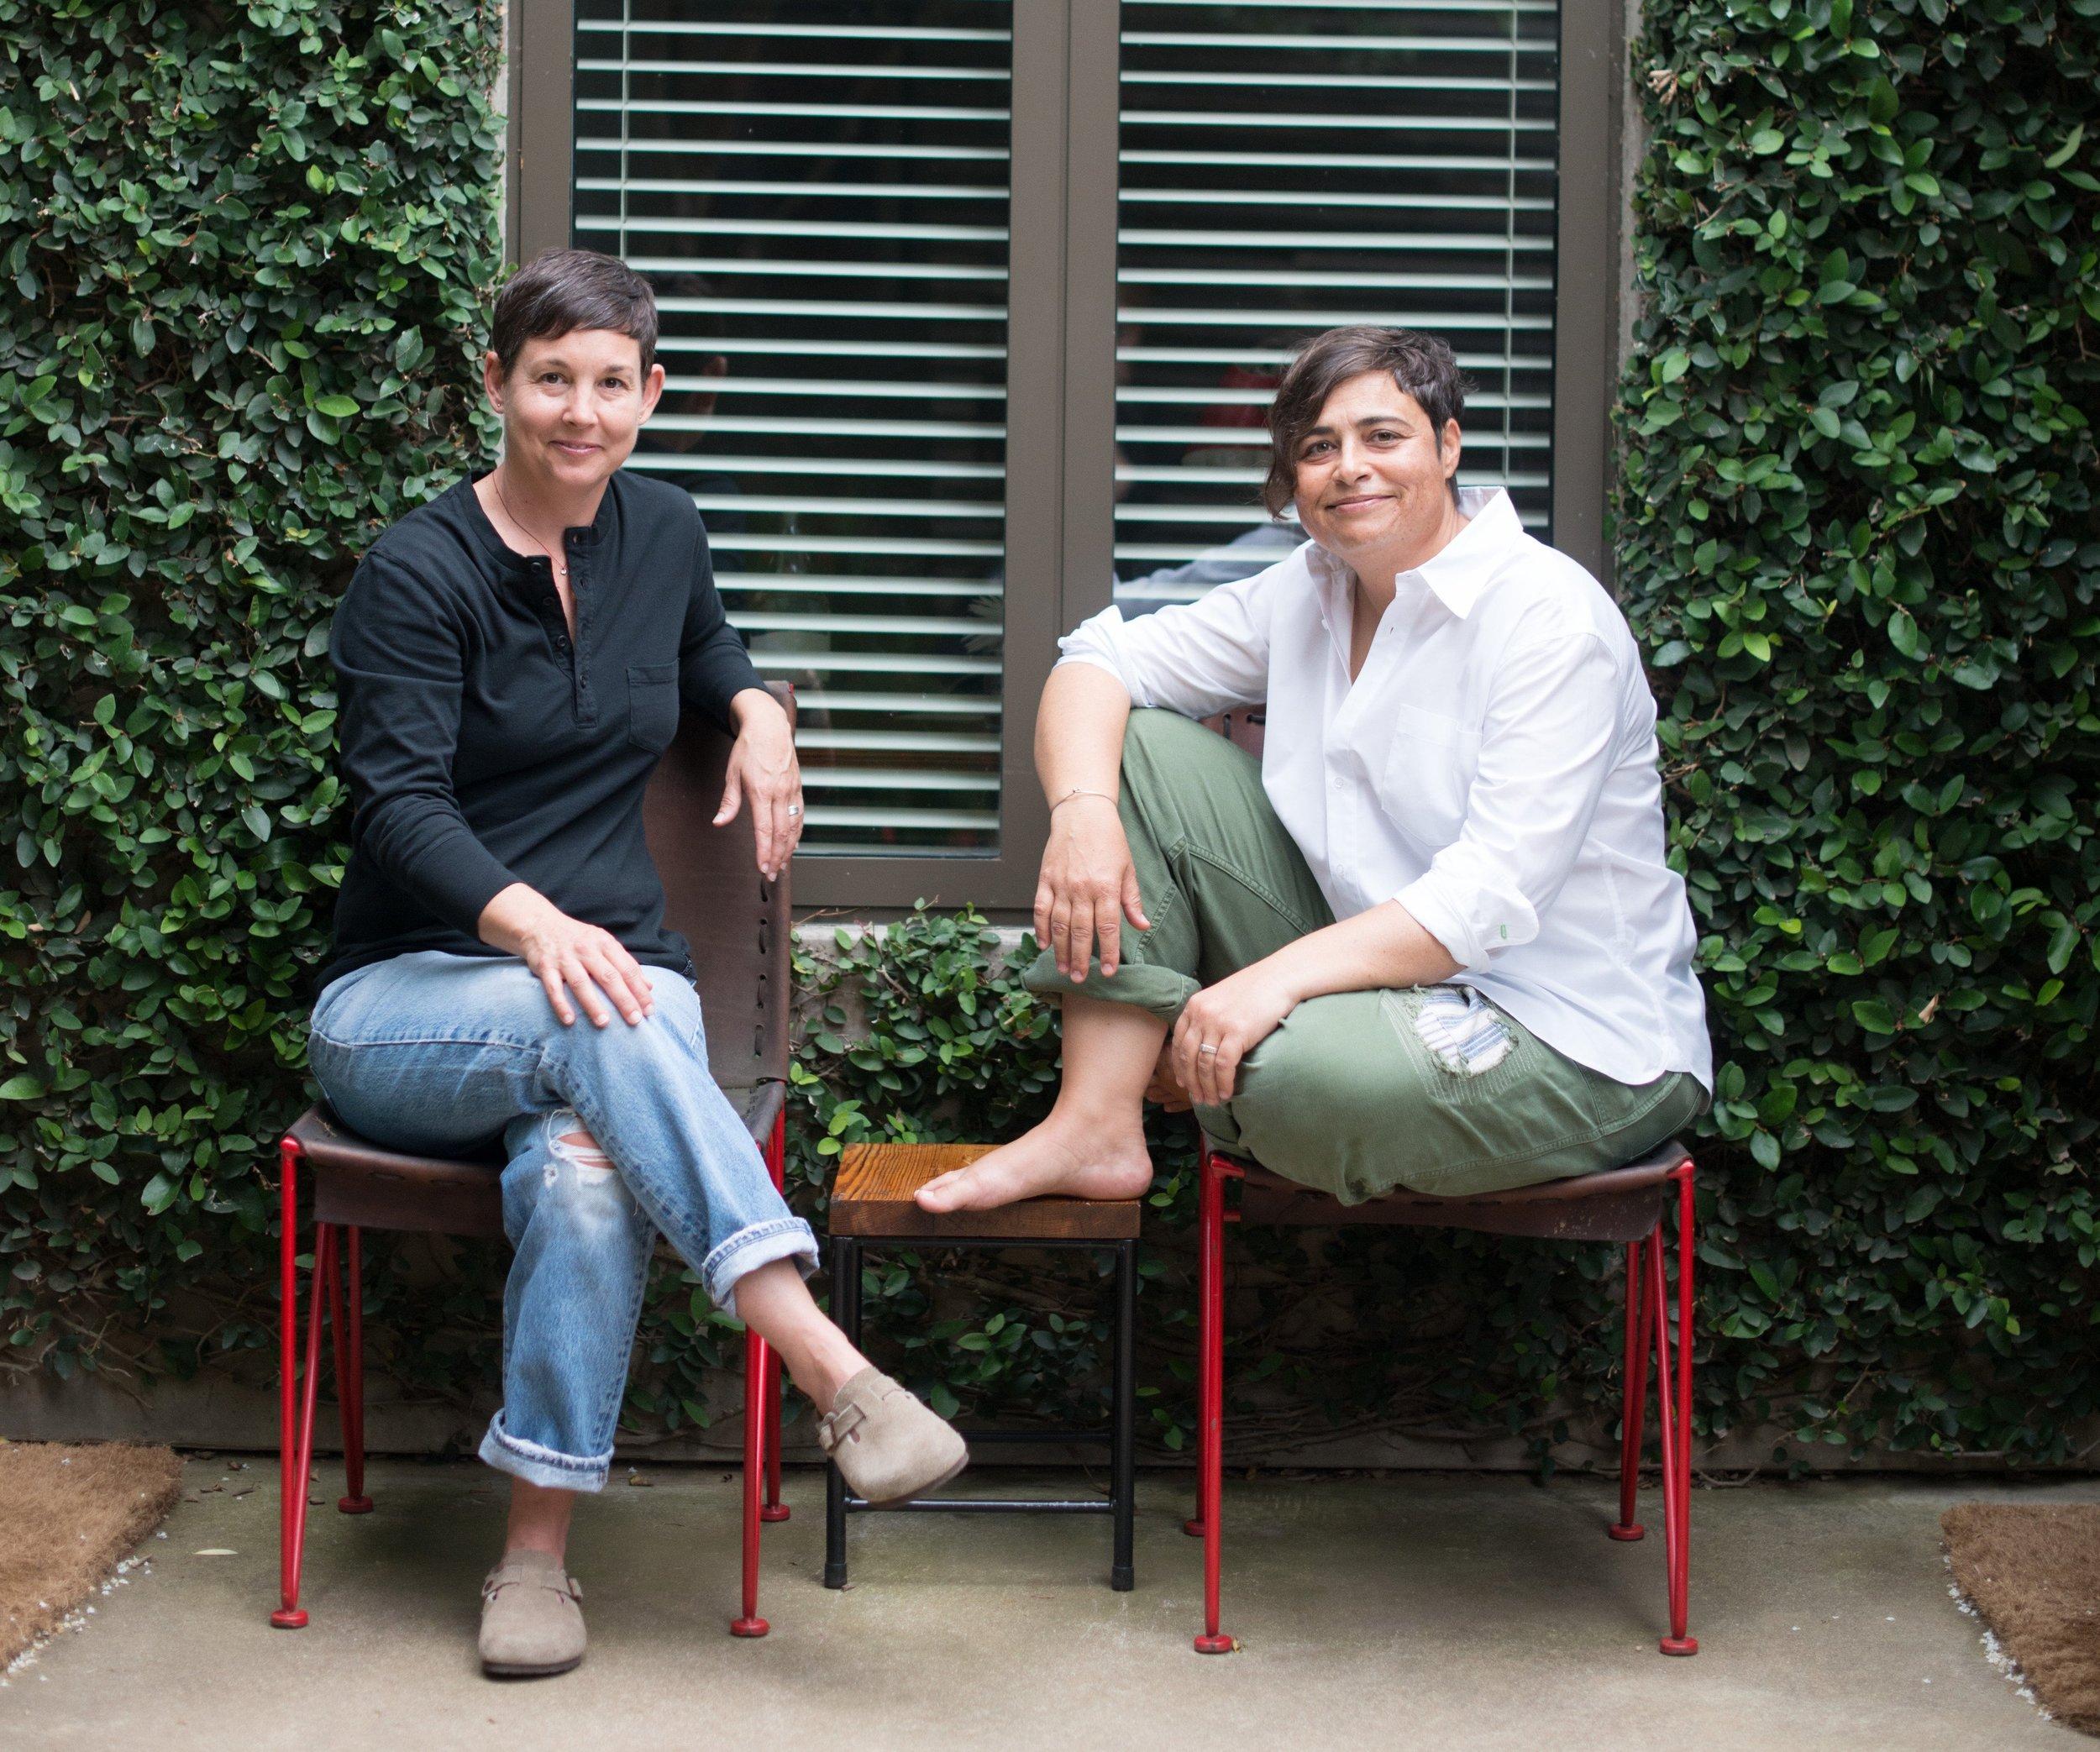 Founders_Ronda_Raymond_and_Noushie_Mirabedi.jpg